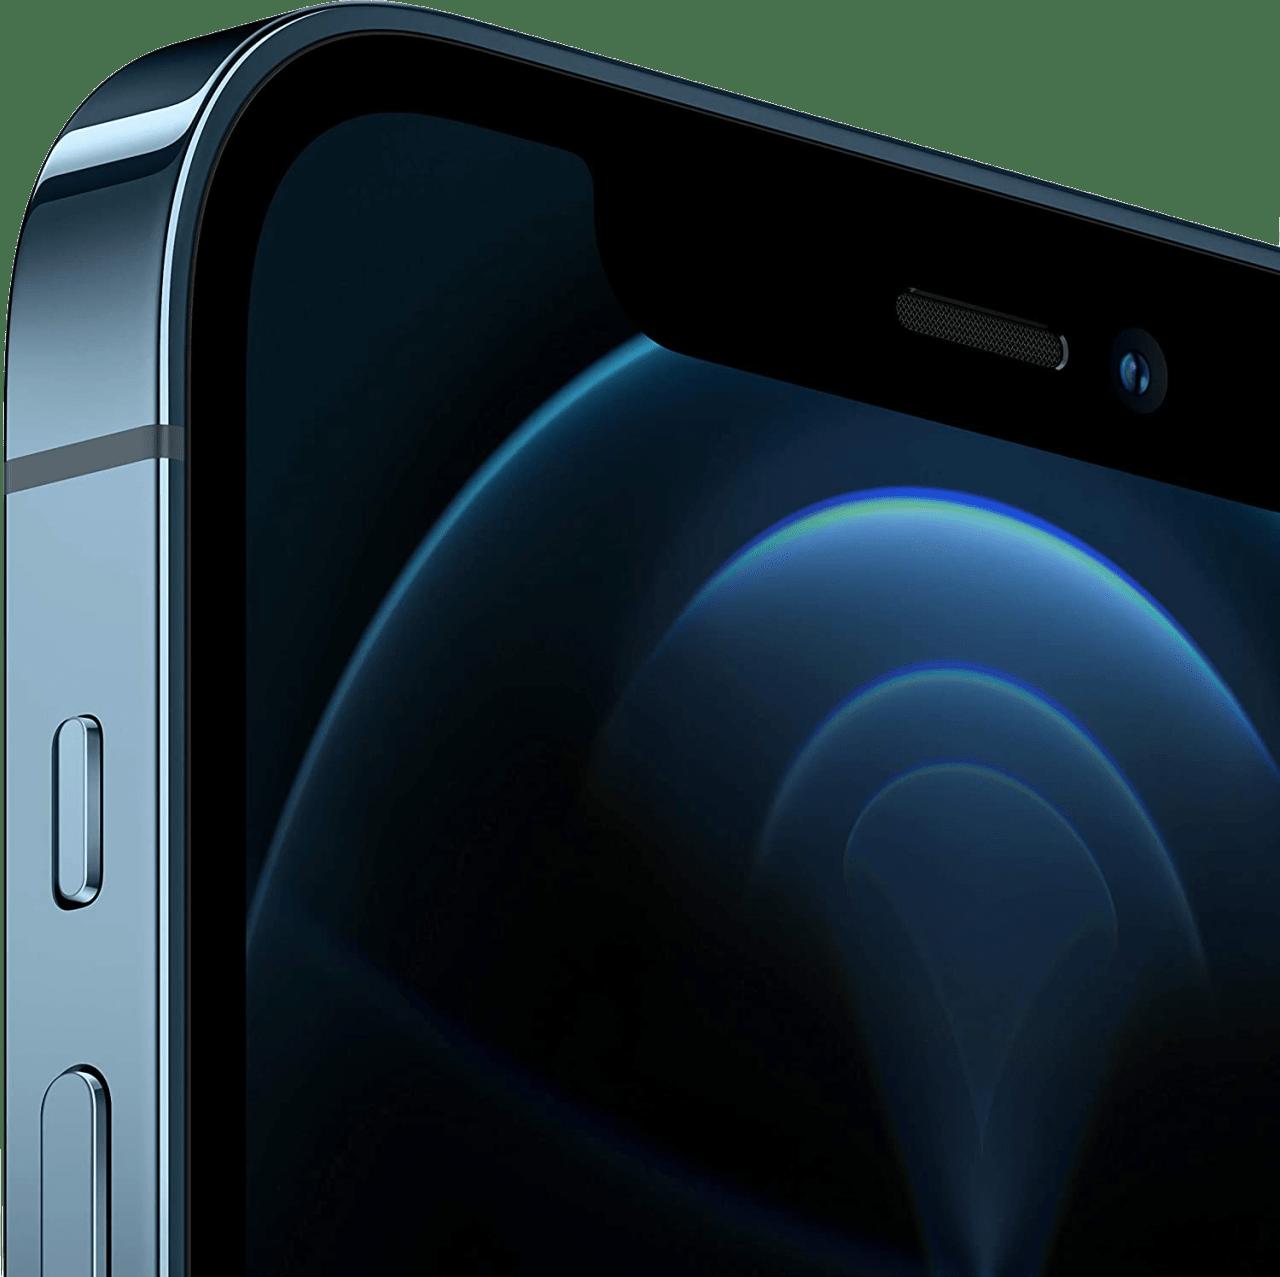 Blau Apple iPhone 12 Pro 512GB.4